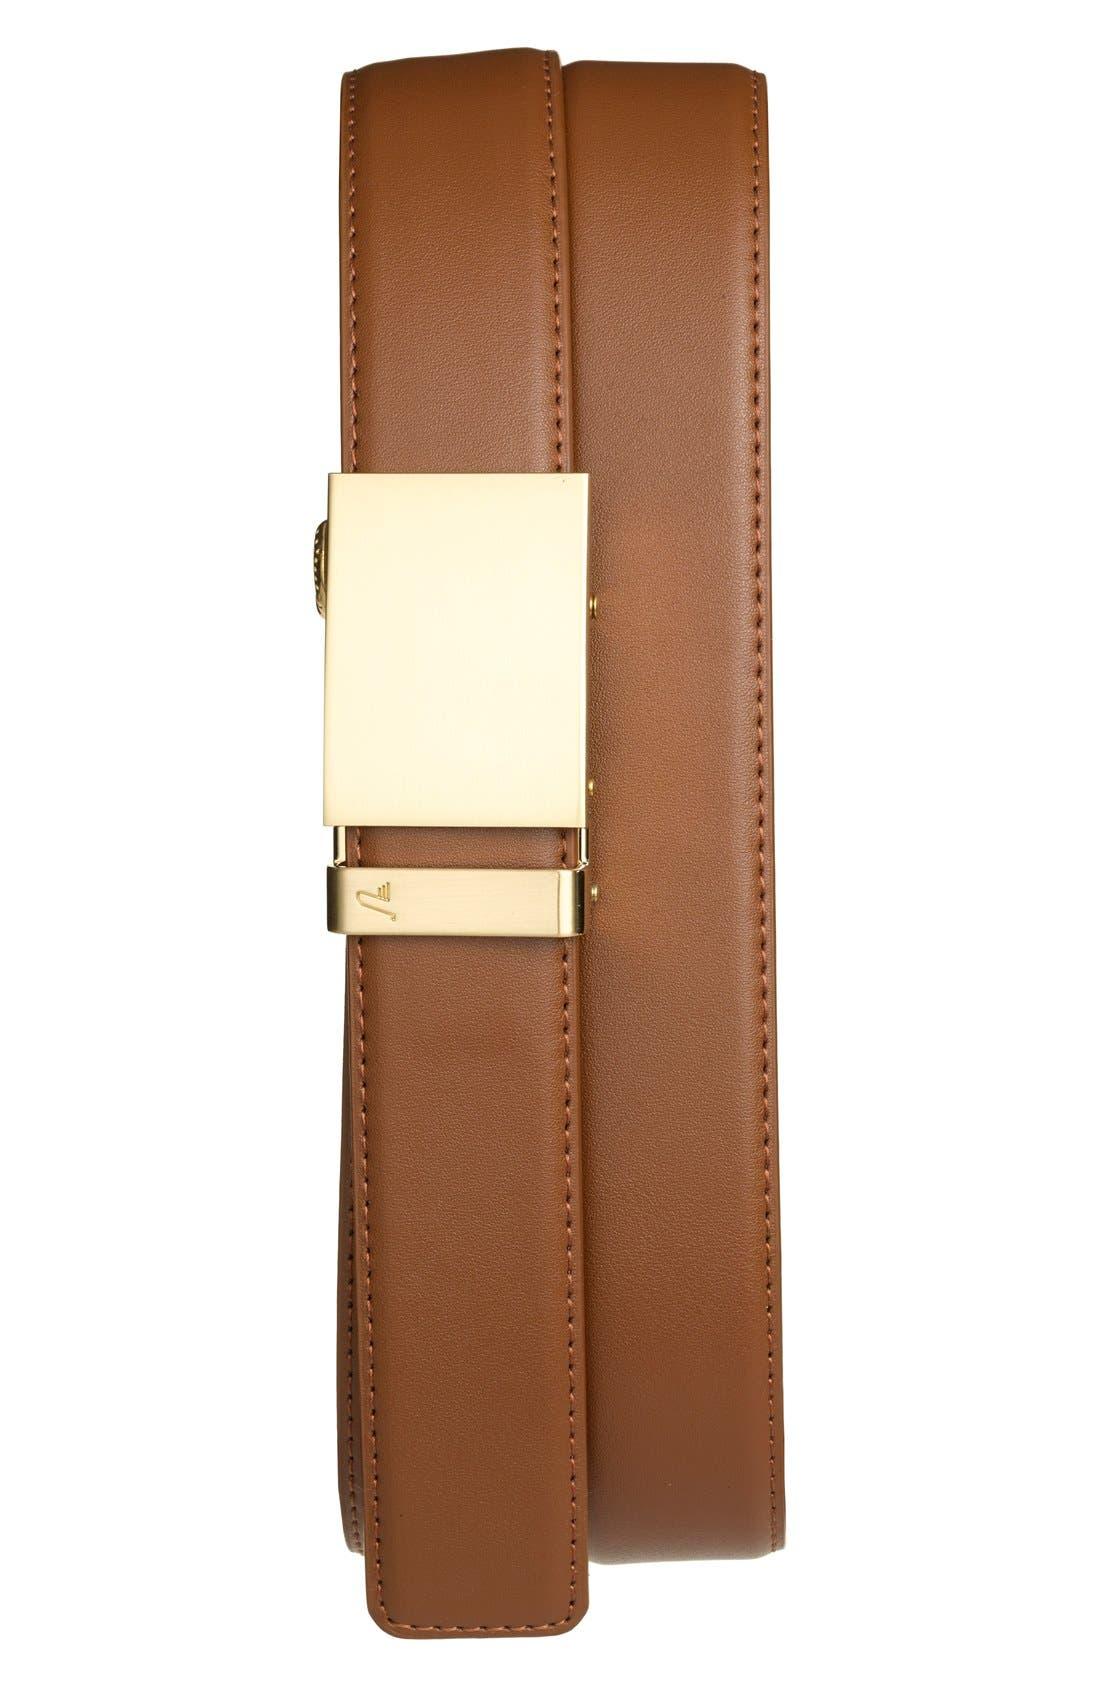 MISSION BELT, 'Gold' Leather Belt, Main thumbnail 1, color, GOLD/ TAN